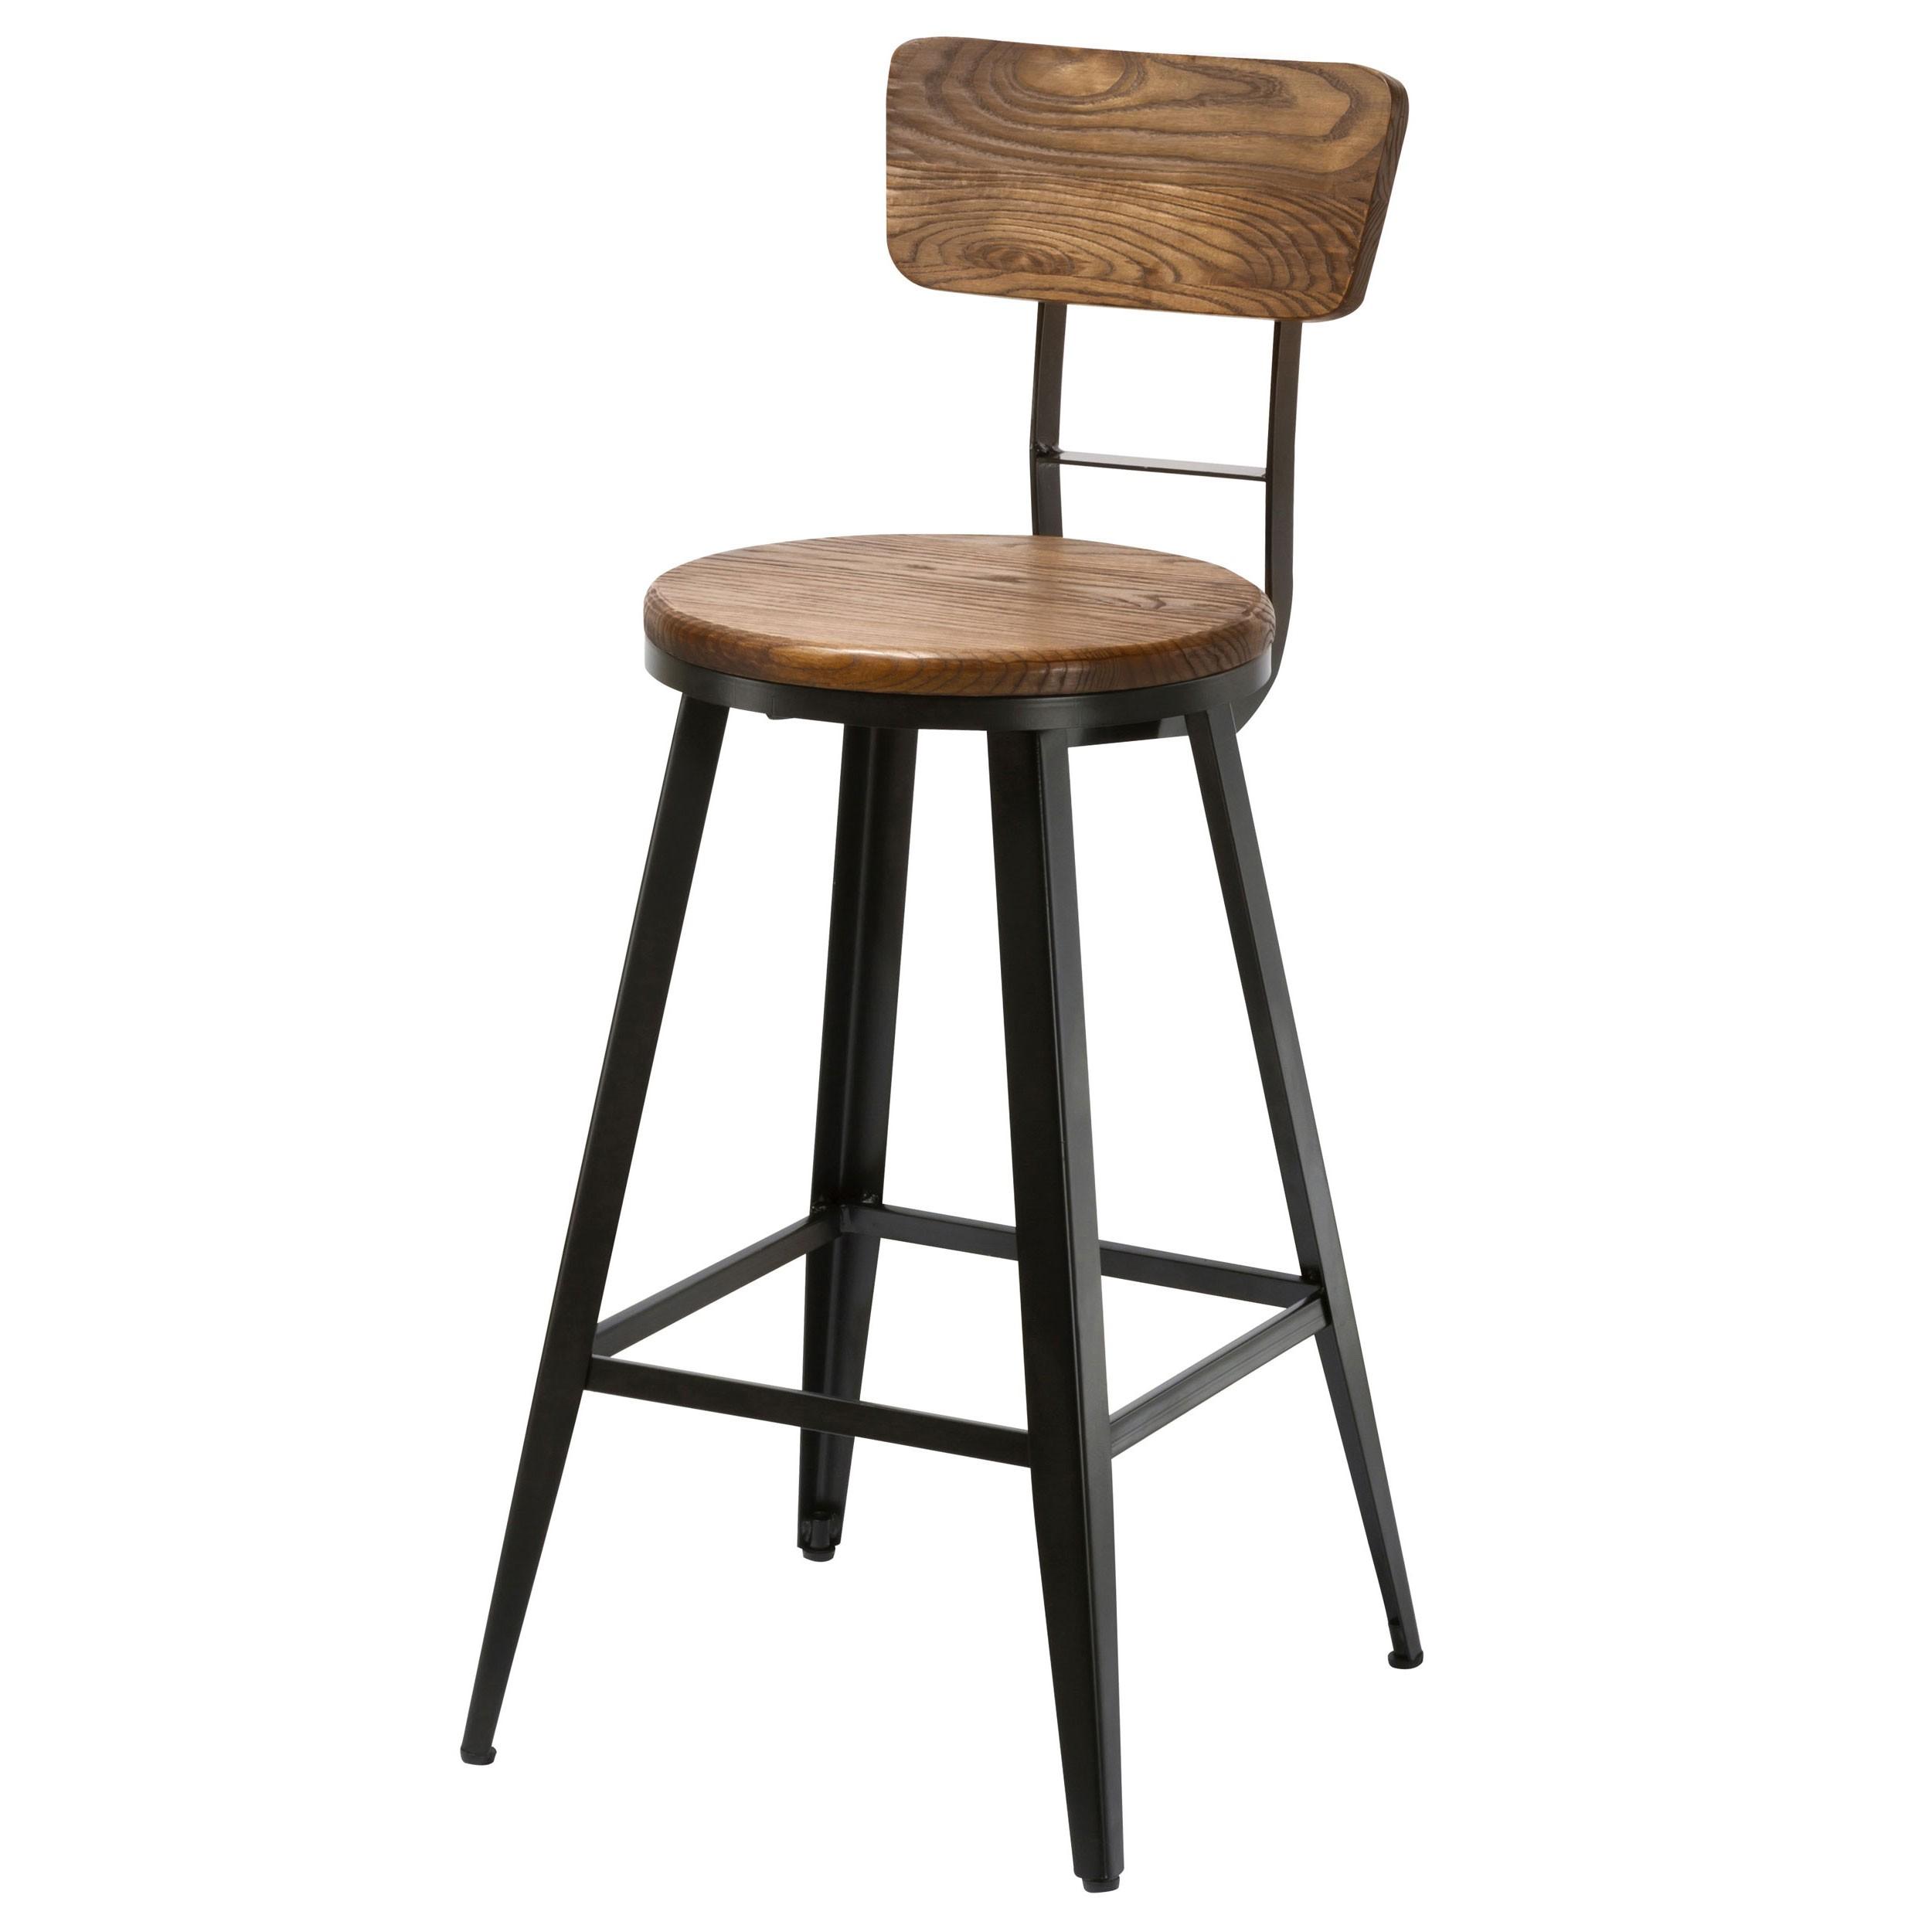 tabouret de bar midland commandez les tabourets de bar midland prix d 39 usine rdv d co. Black Bedroom Furniture Sets. Home Design Ideas